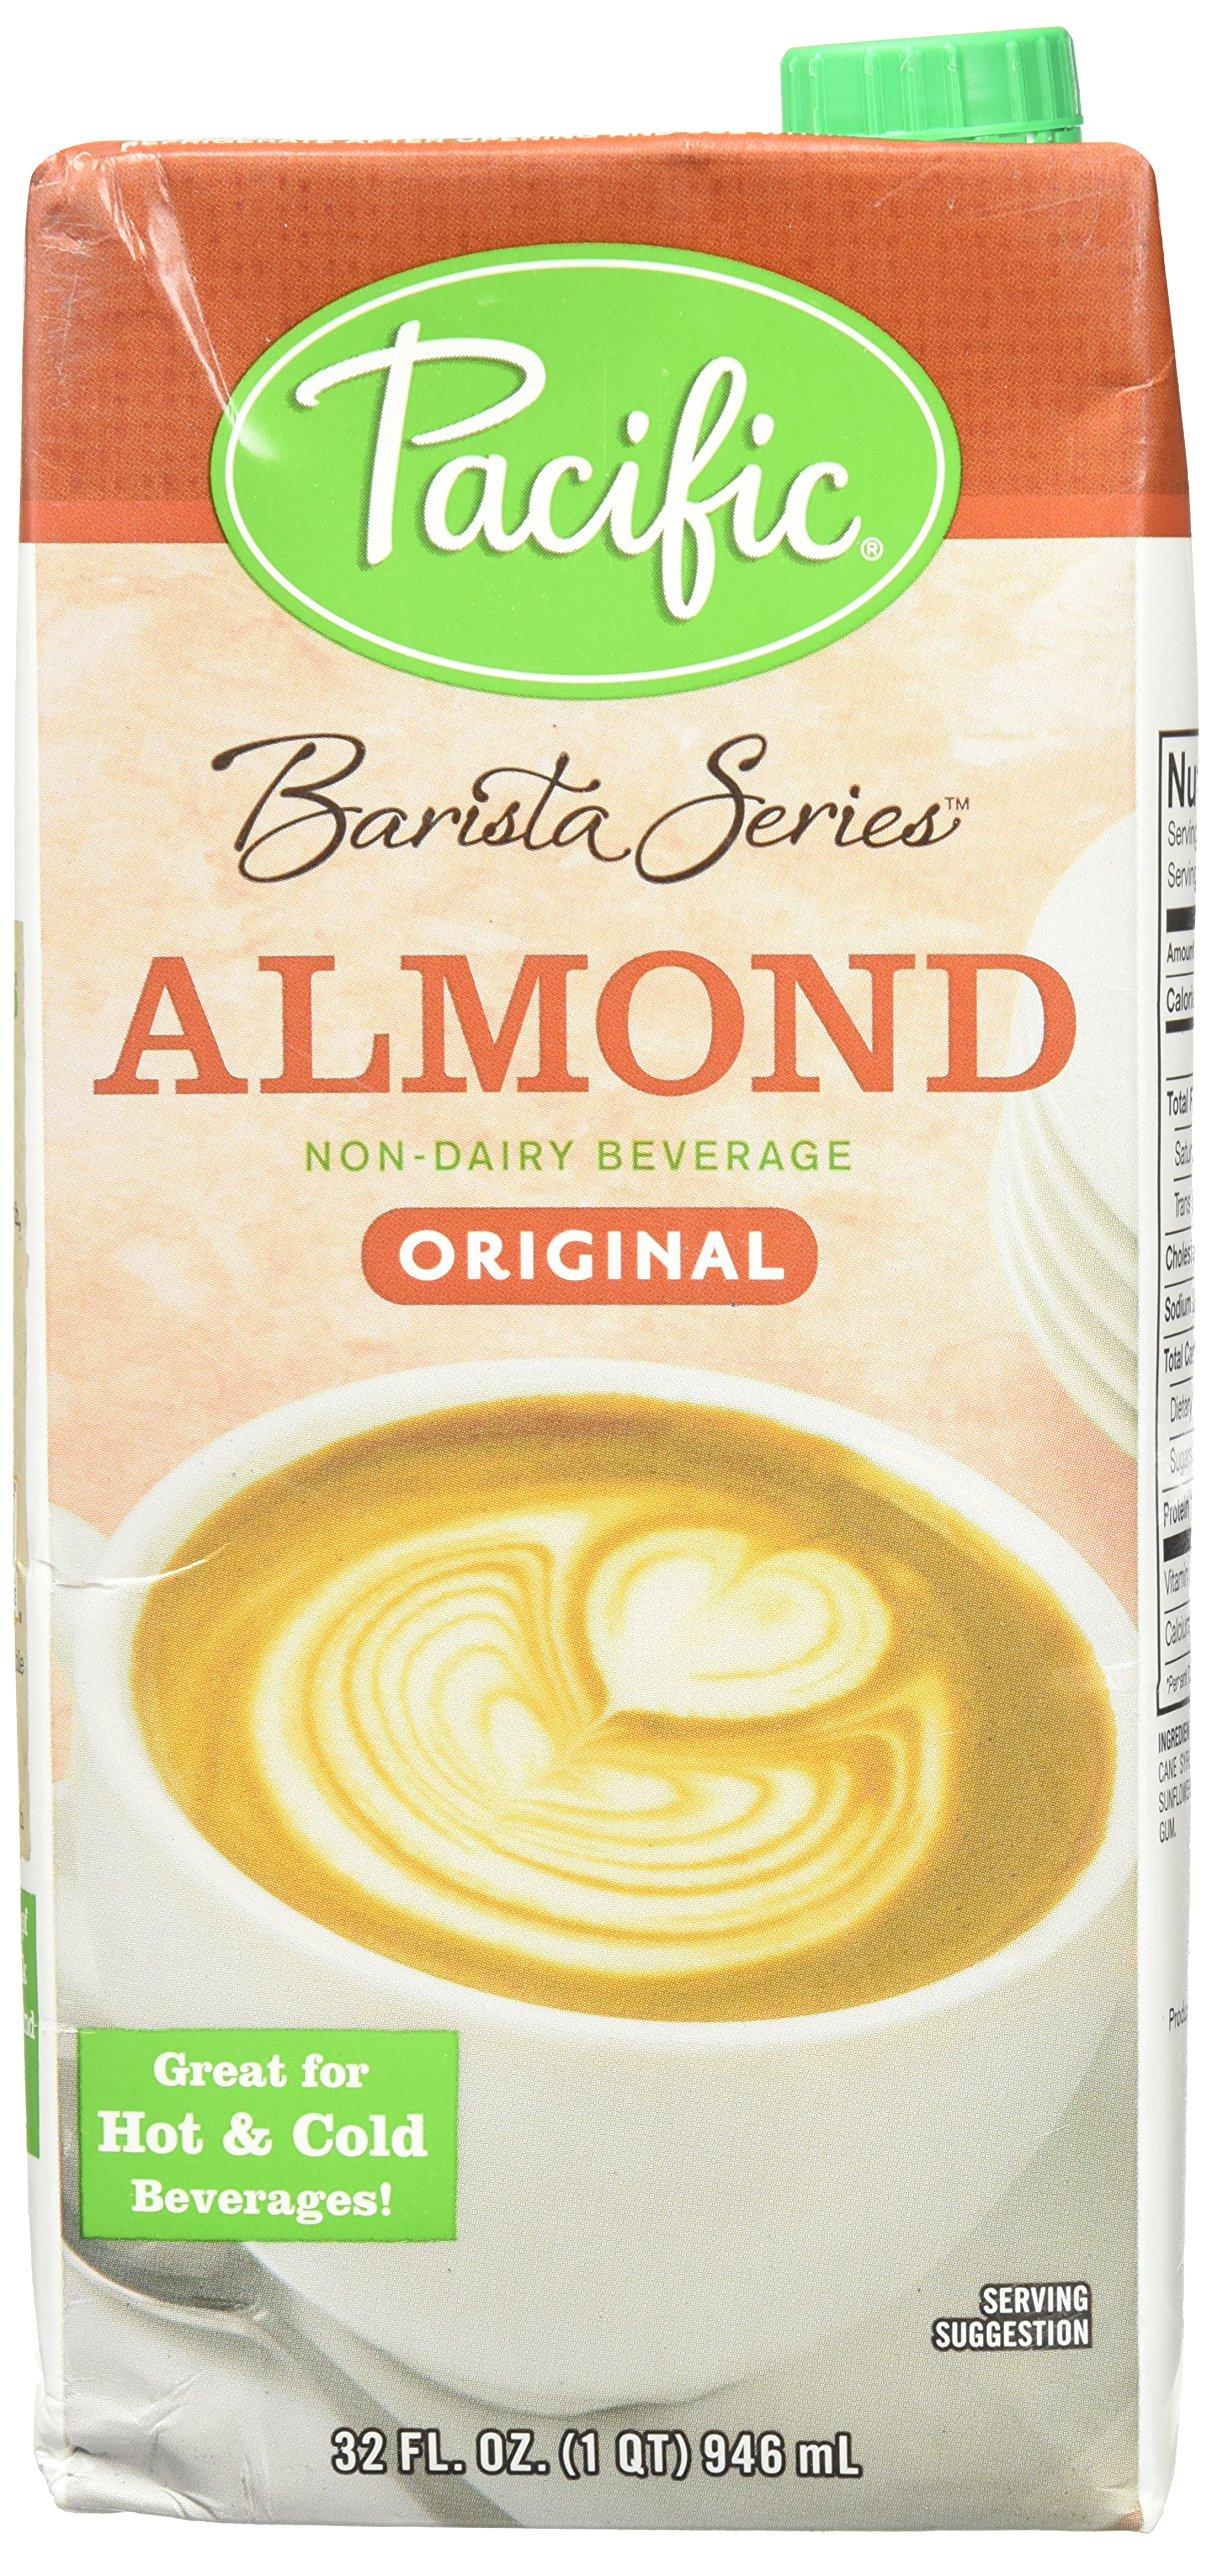 Pacific Barista Series Original Almond Beverage 32 Oz - Pack of 3